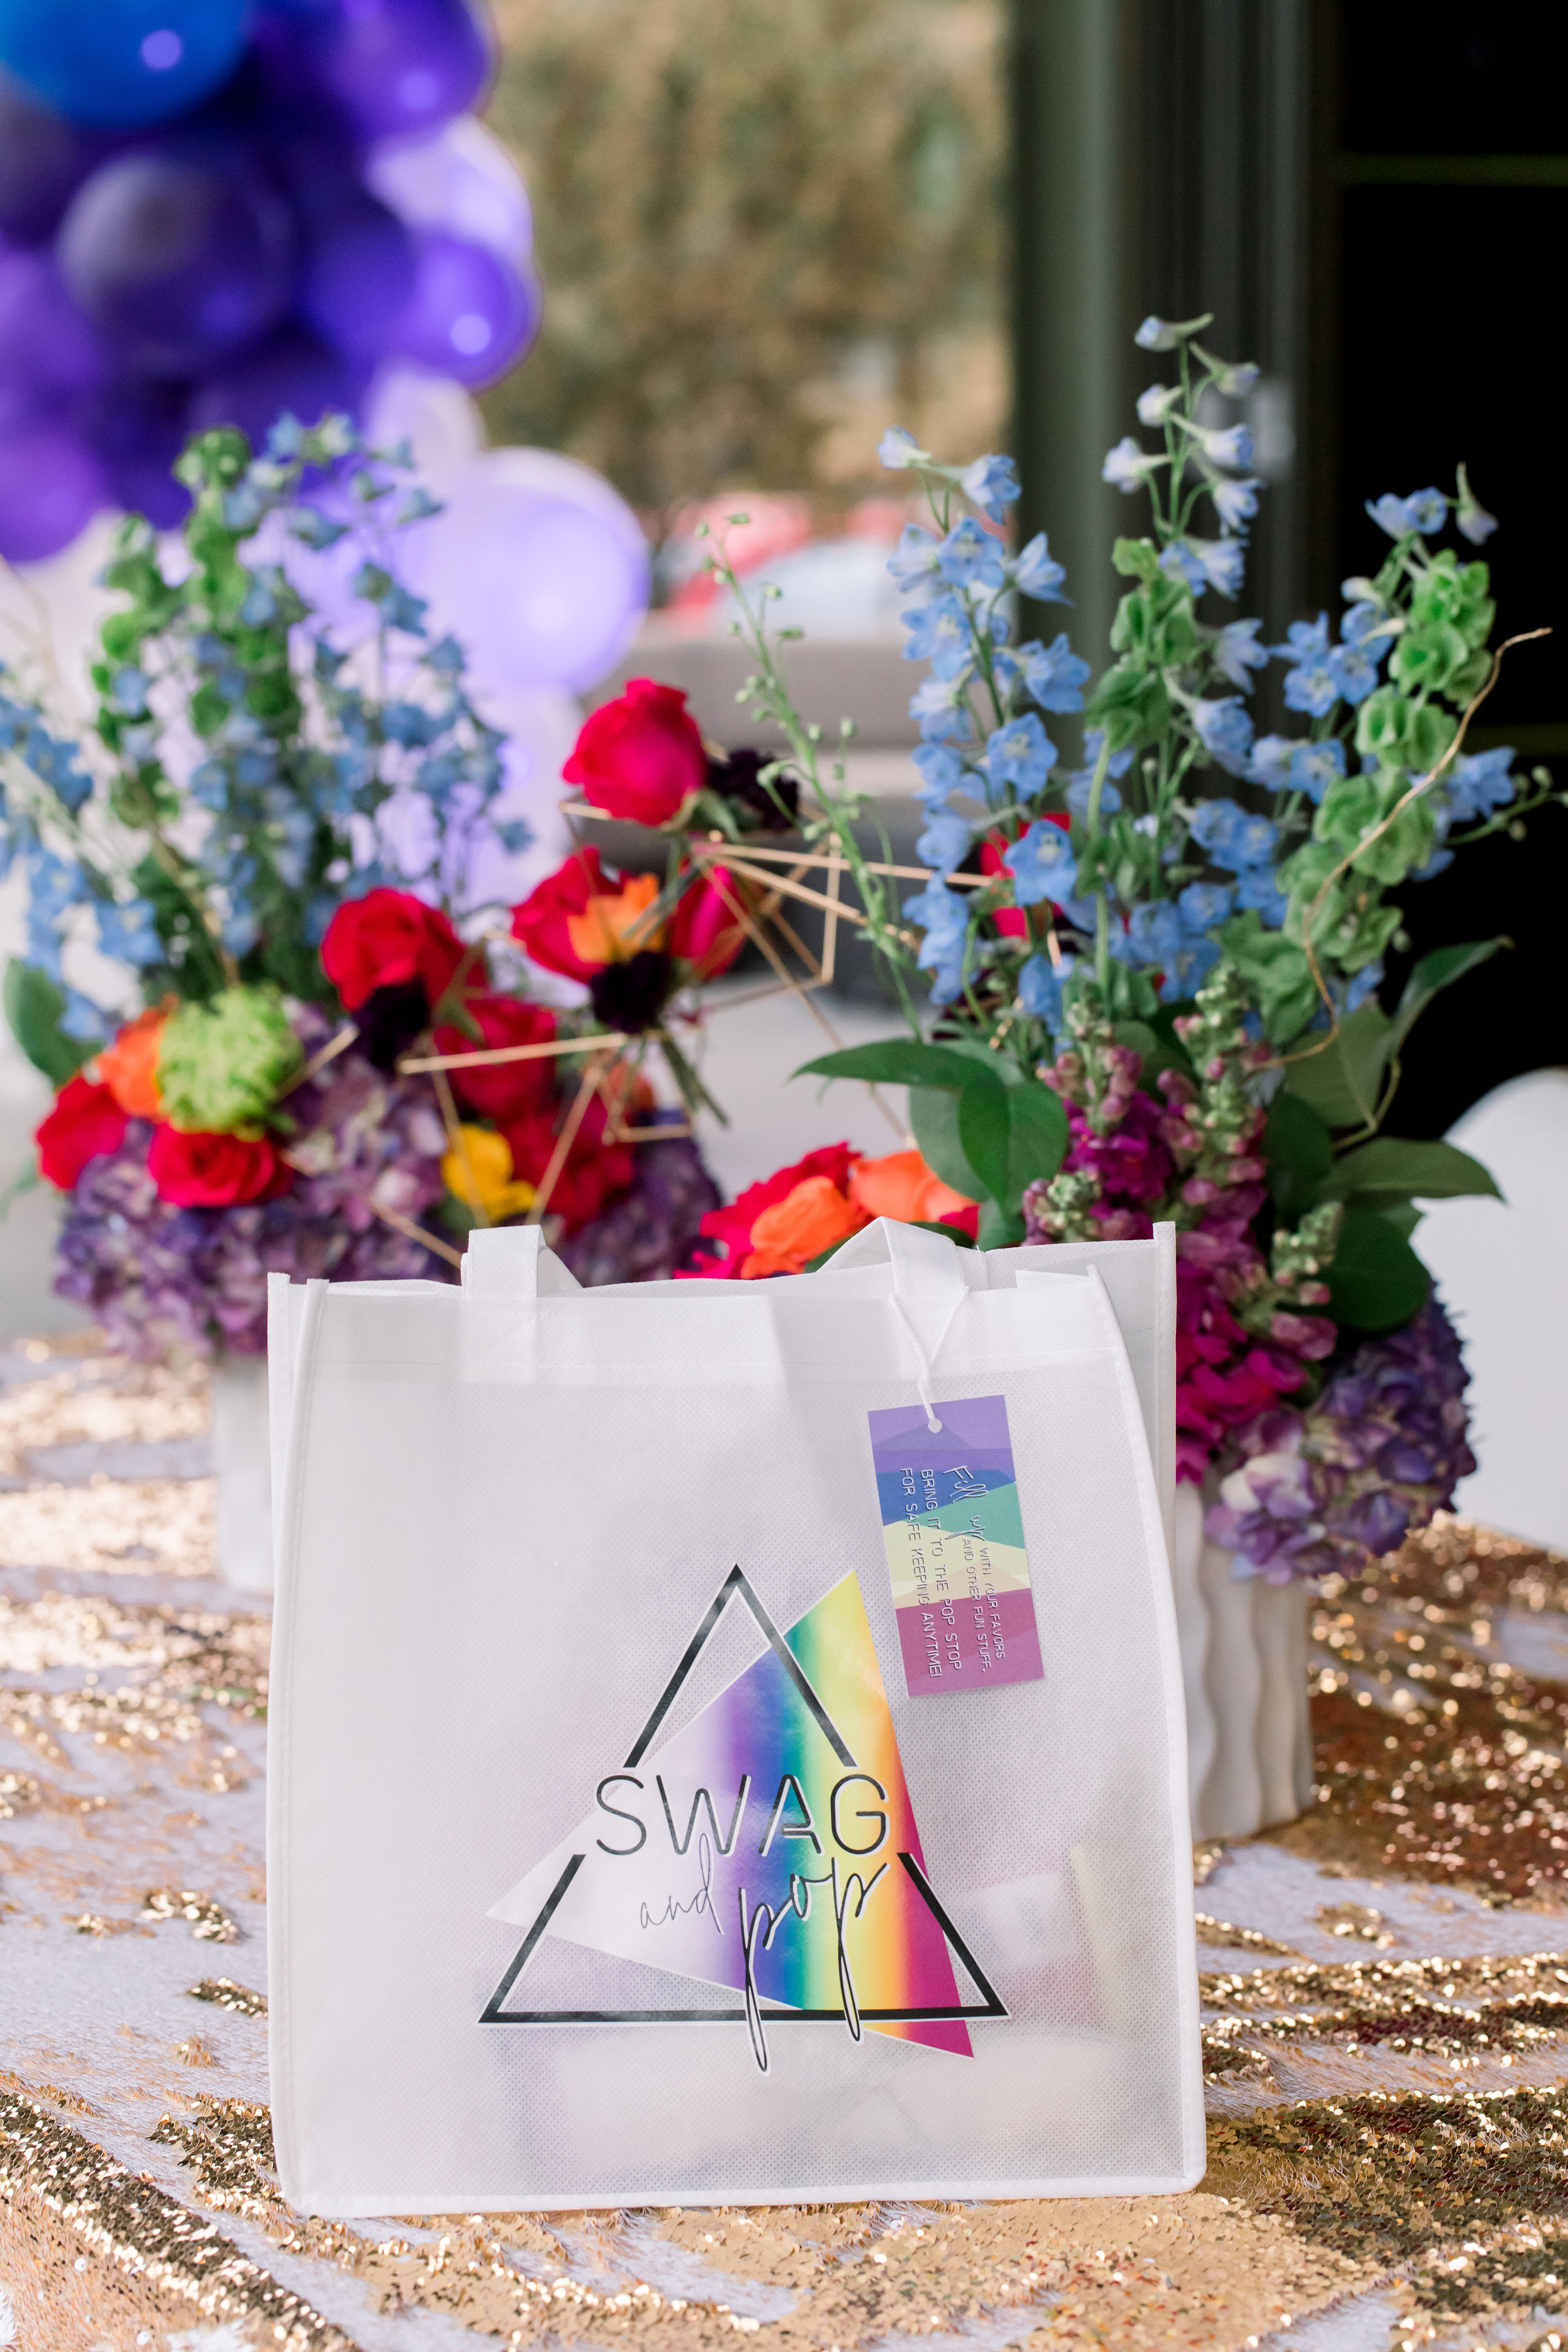 48 swag bag guest gift bag custom tote personalized logo rainbow bat mitzvah Life Design Events photos by Stephanie Heymann Photography.jpg